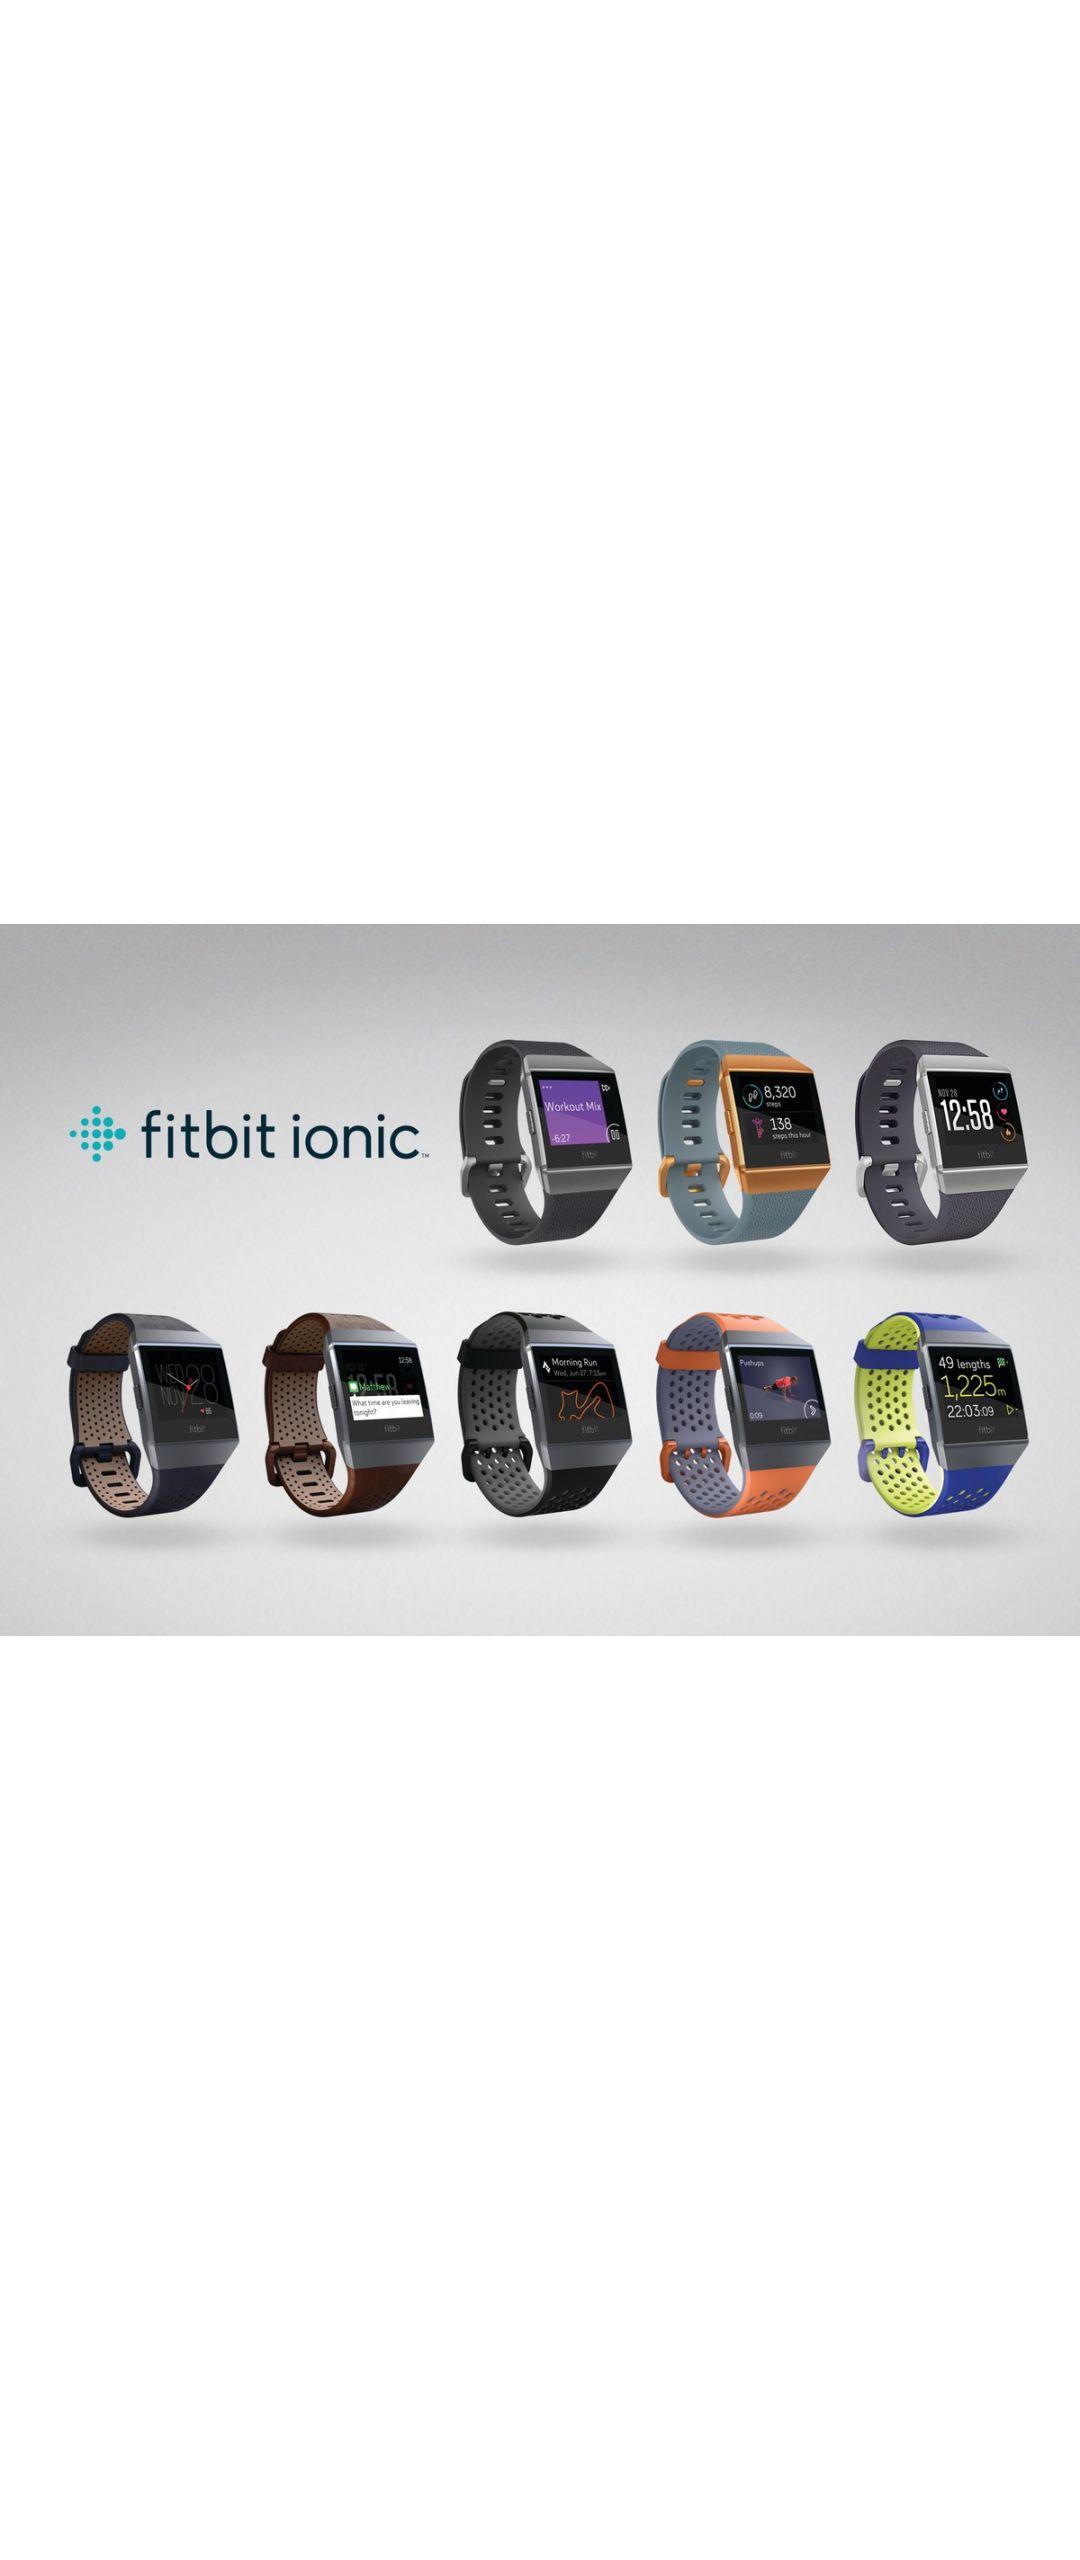 Fitbit Ionic, el primer smartwatch de Fitbit